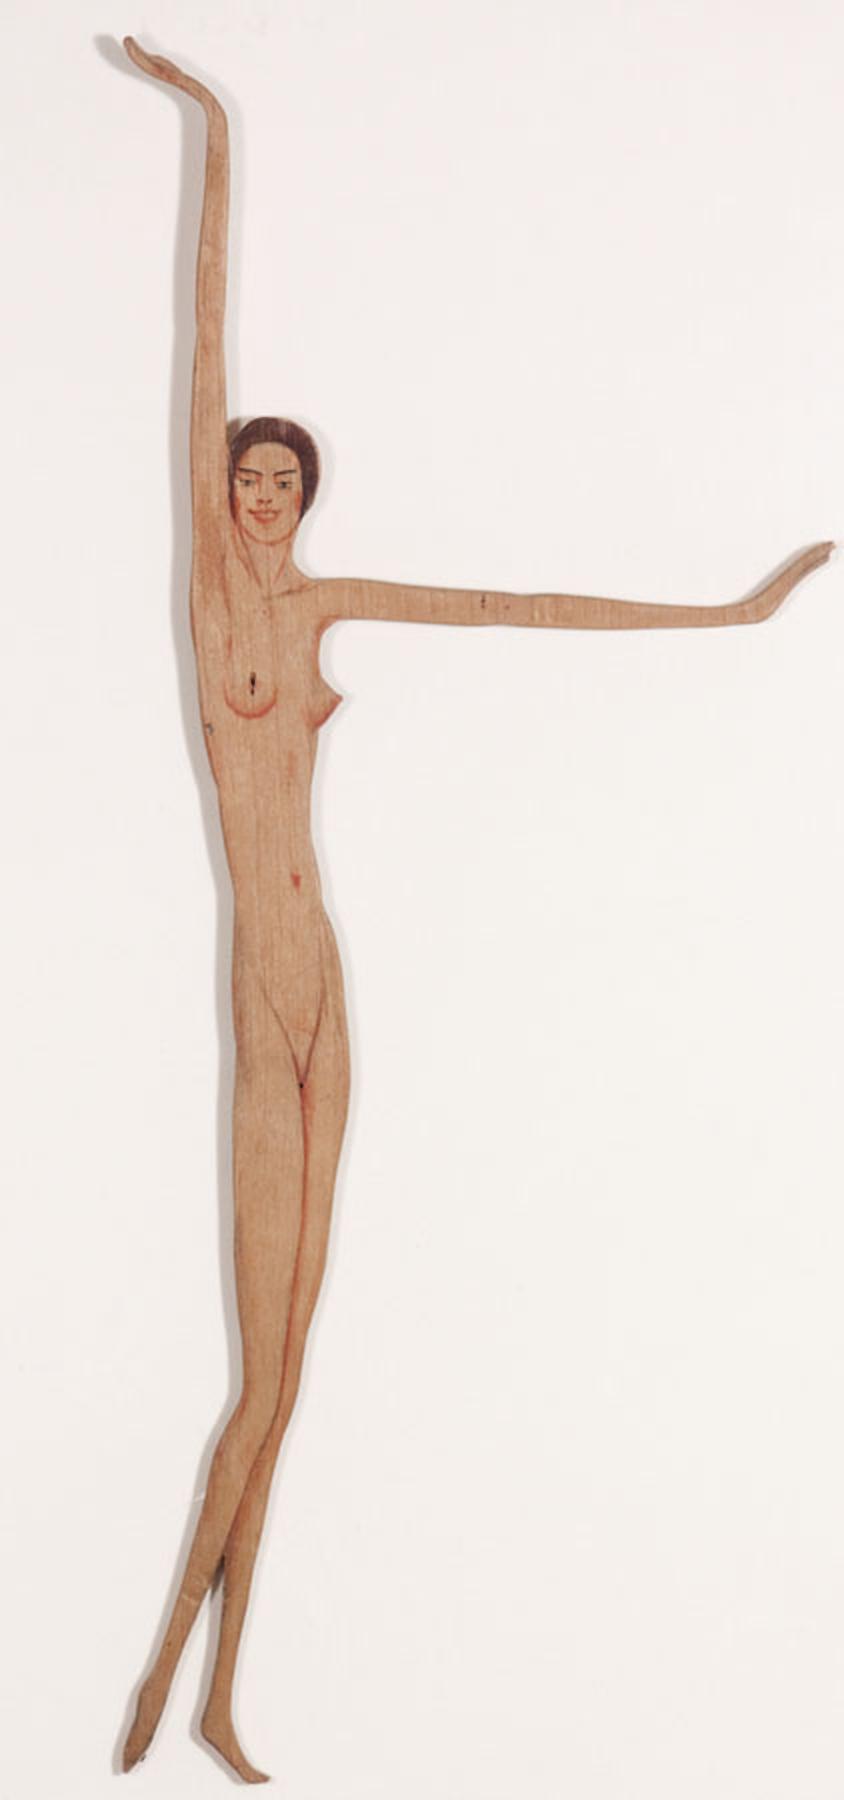 František Drtikol -(Nude with Arms Raised) ,Nd